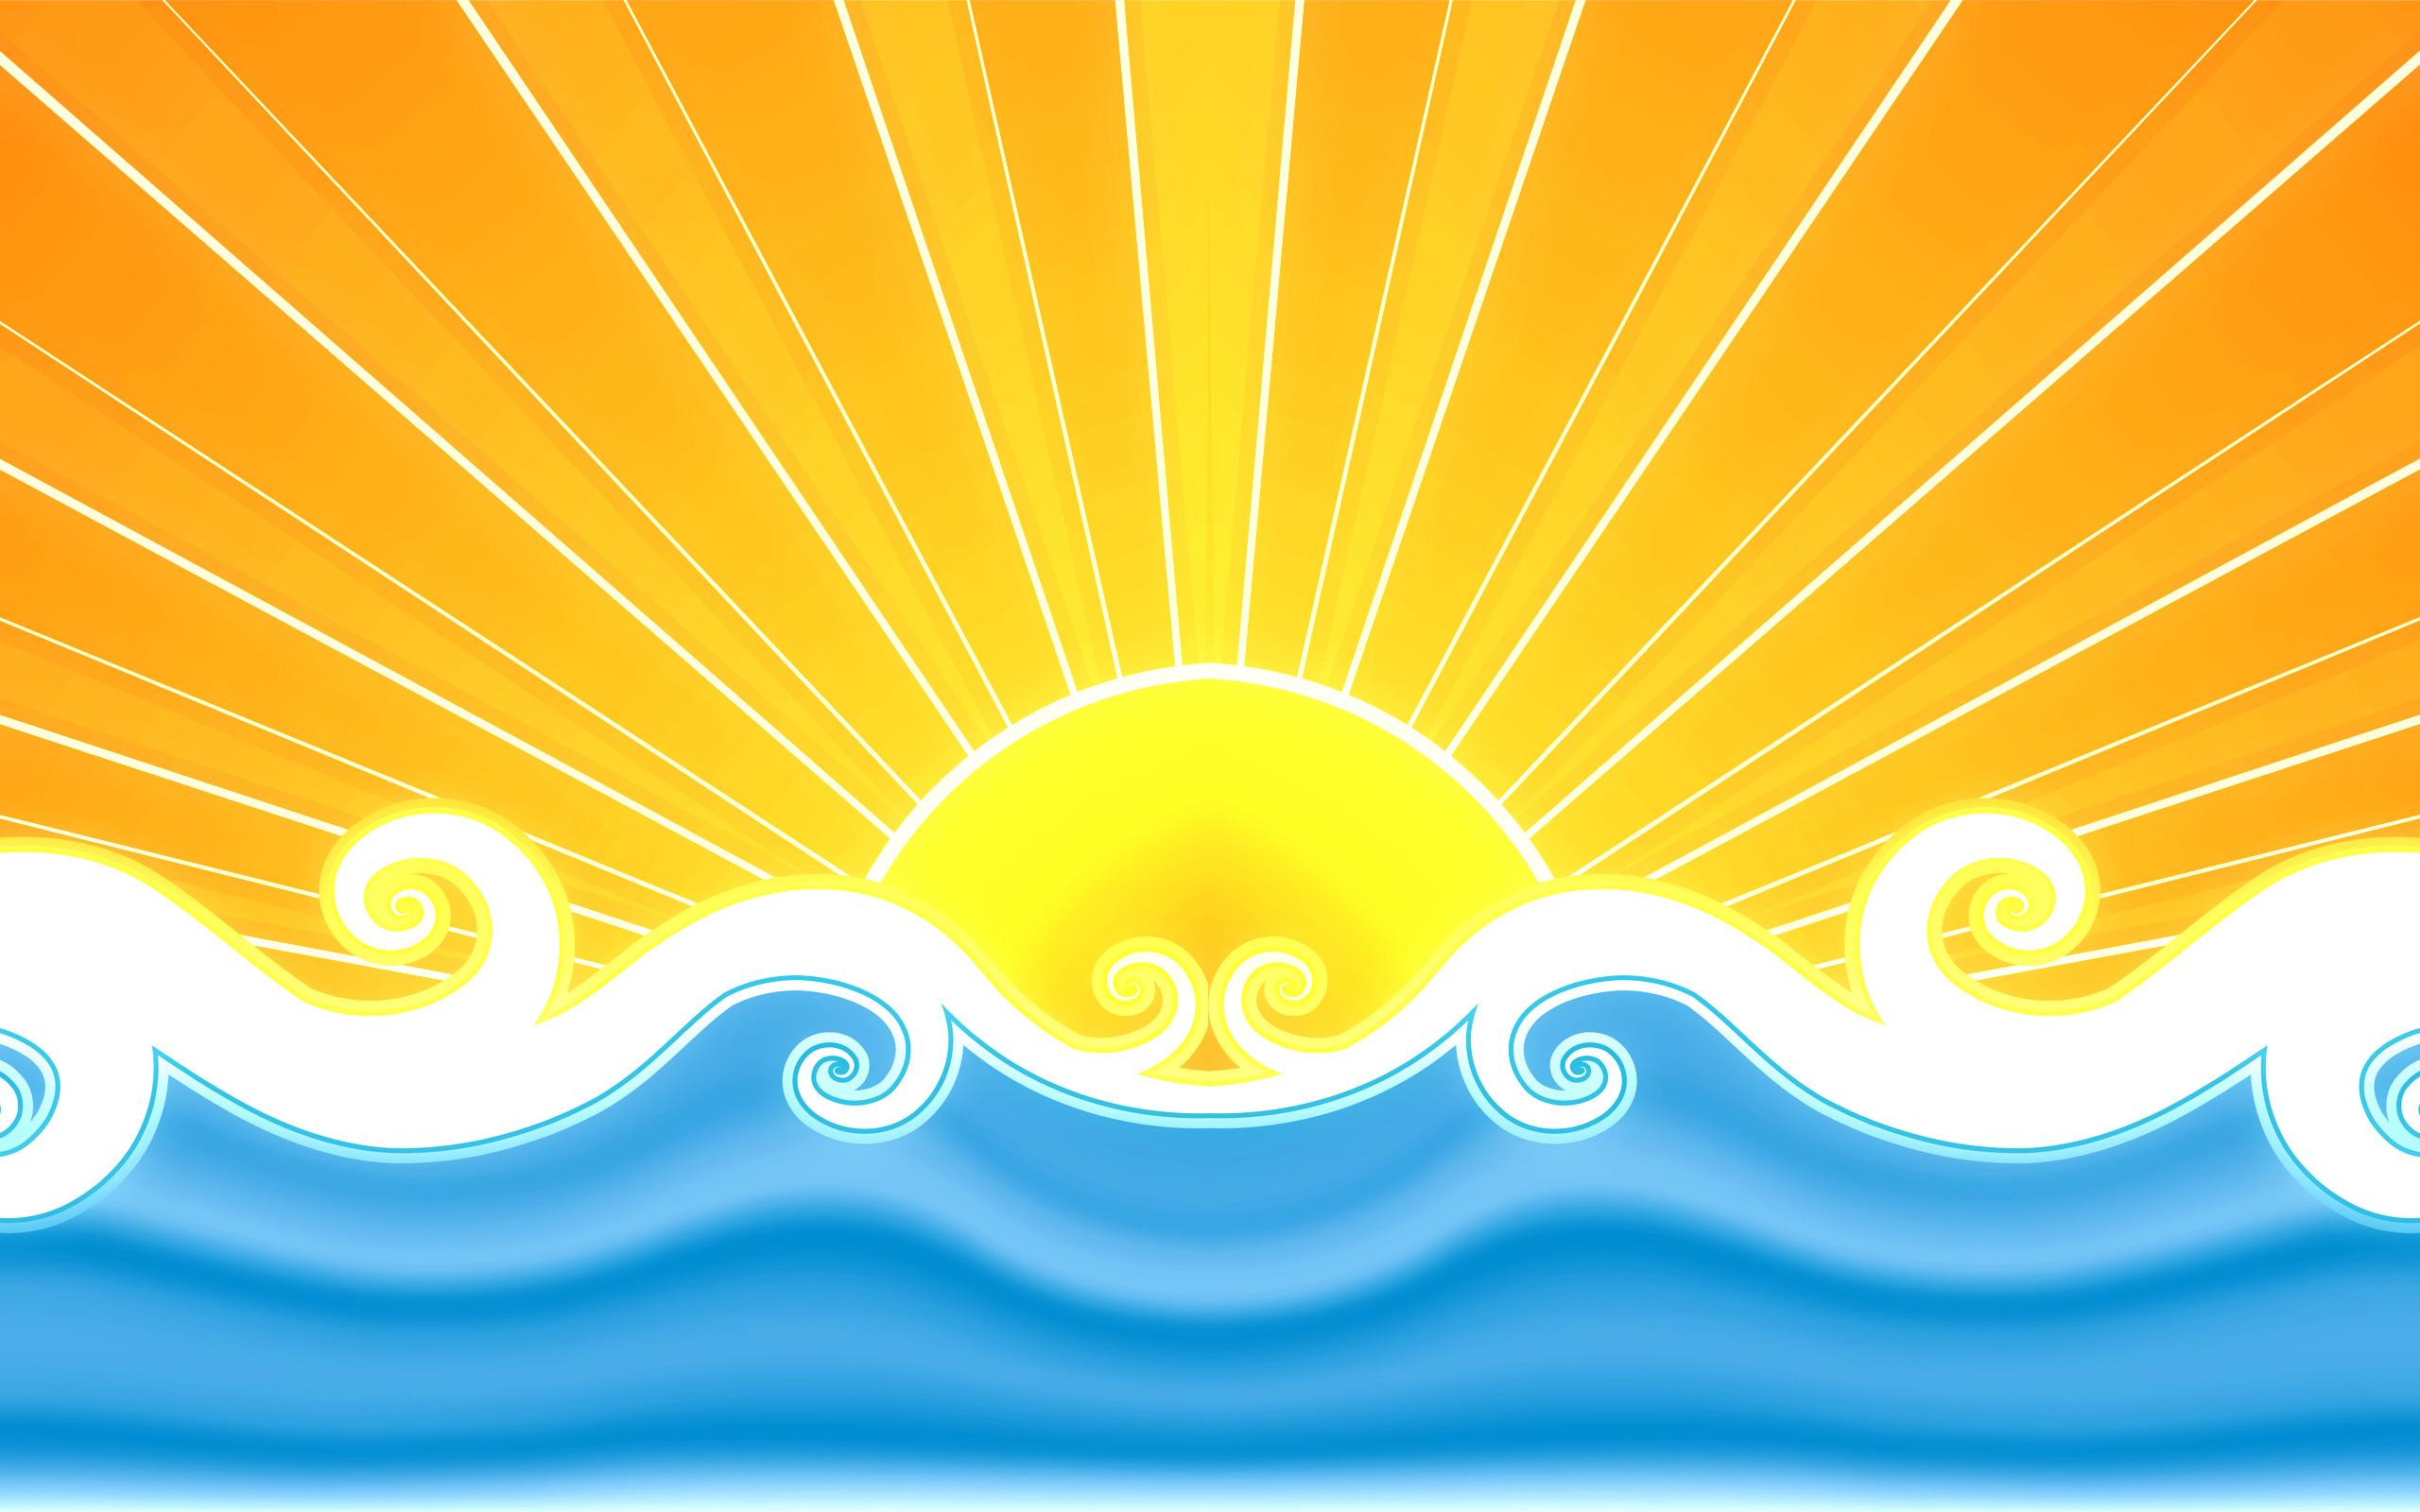 2560x1600 Beach Vector Wallpapers Top Hdq Beach Vector Images, Wallpapers